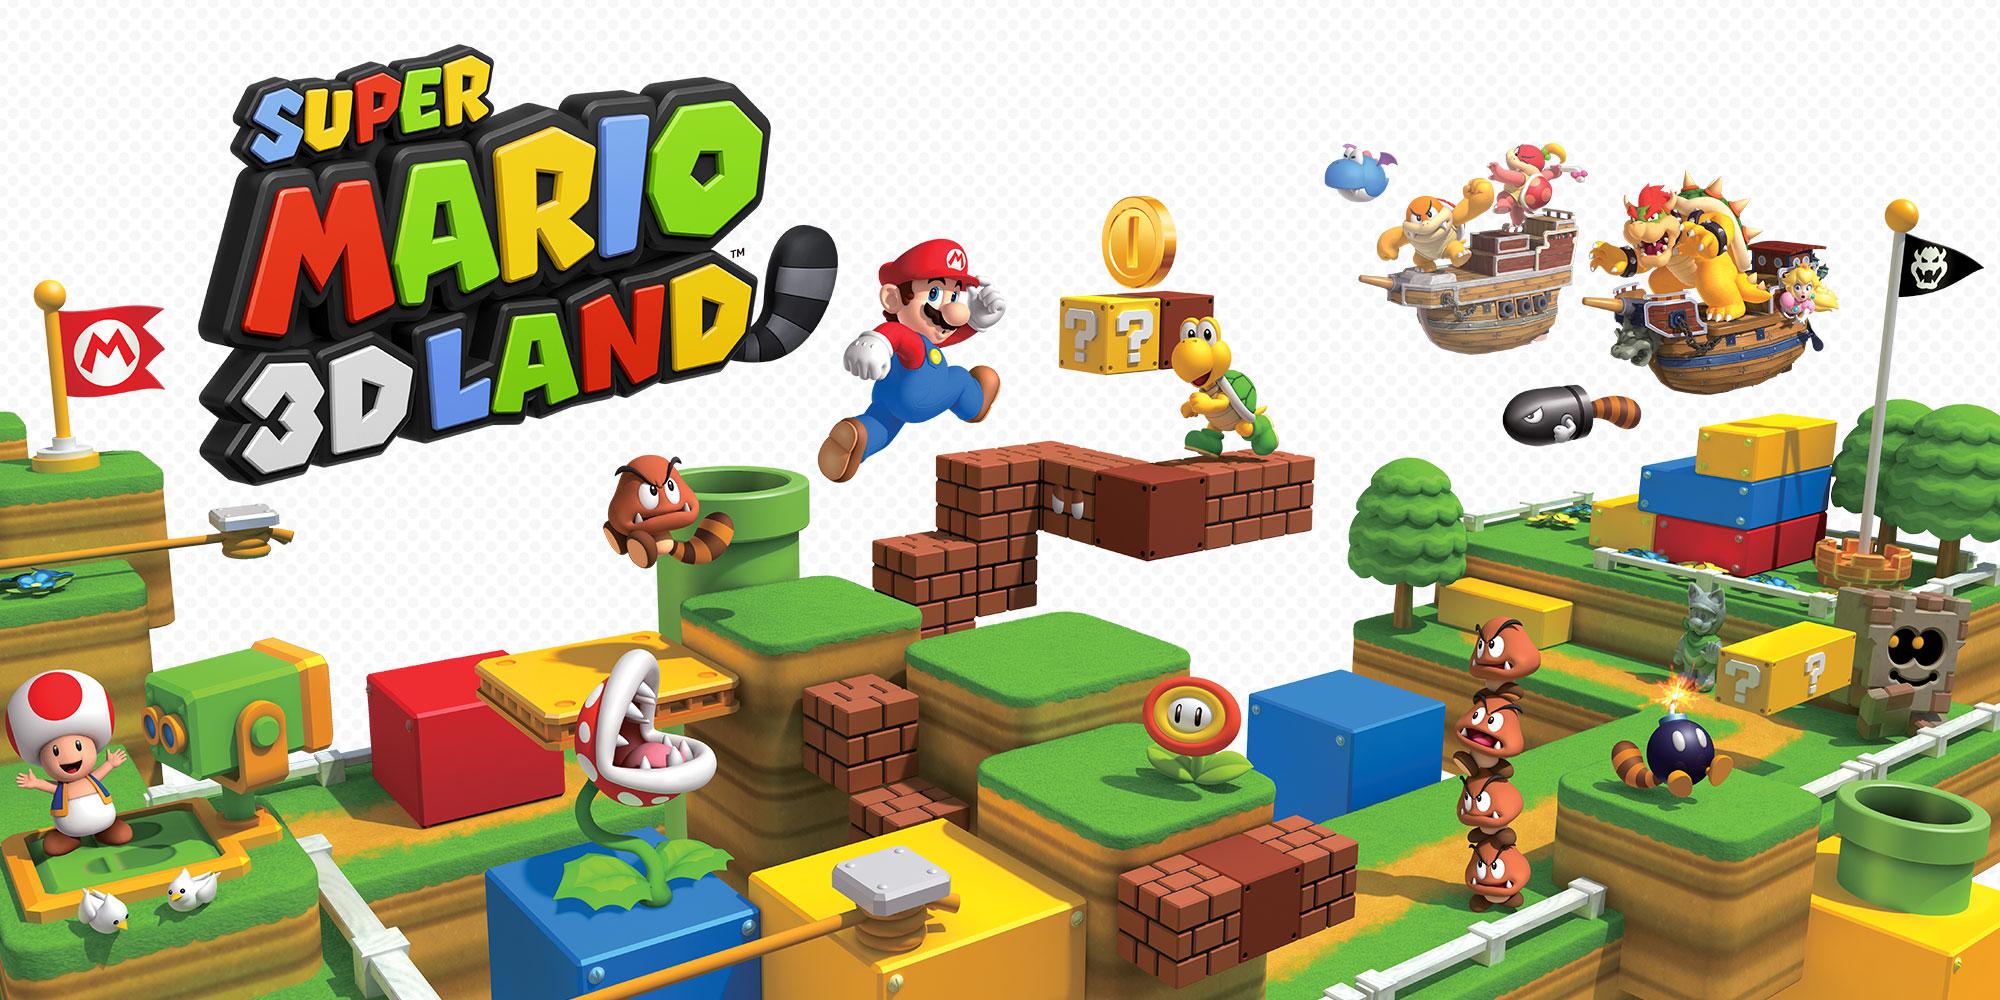 super mario 3d land nintendo 3ds games nintendo. Black Bedroom Furniture Sets. Home Design Ideas